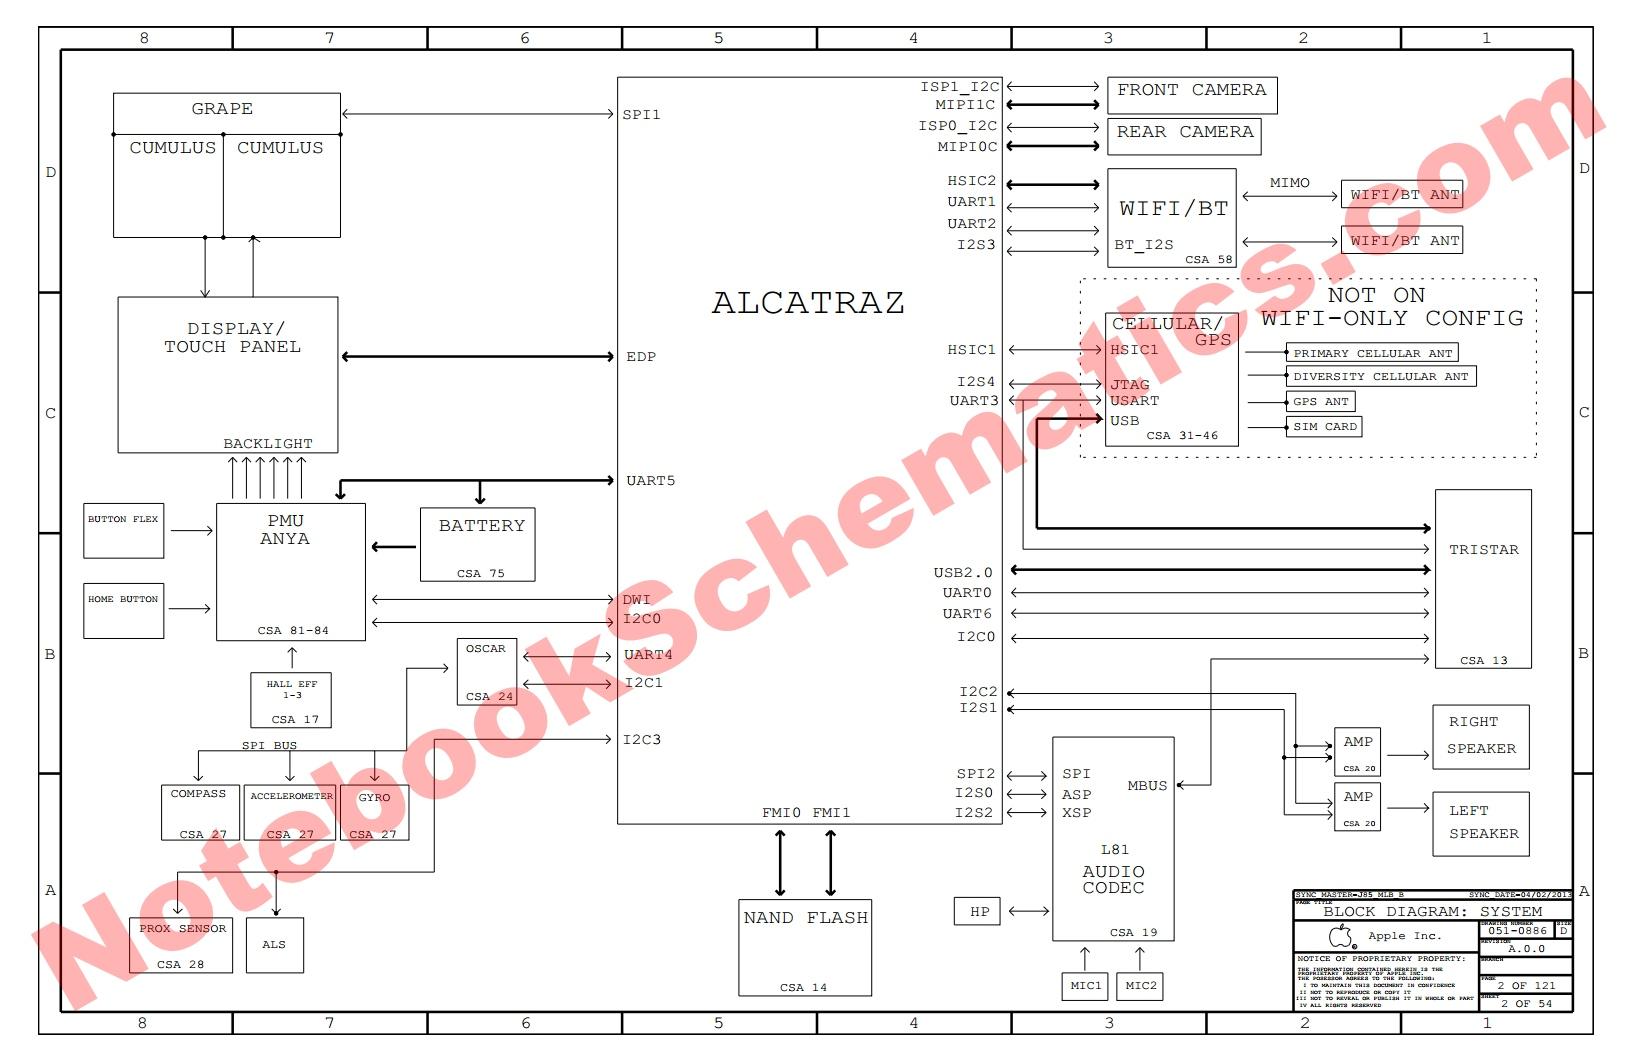 Ipad Mini 2 Schematic Diagram Logic Board Apple Retina X200 Notebookschematics Com Notebook Schematics At Best Parts For